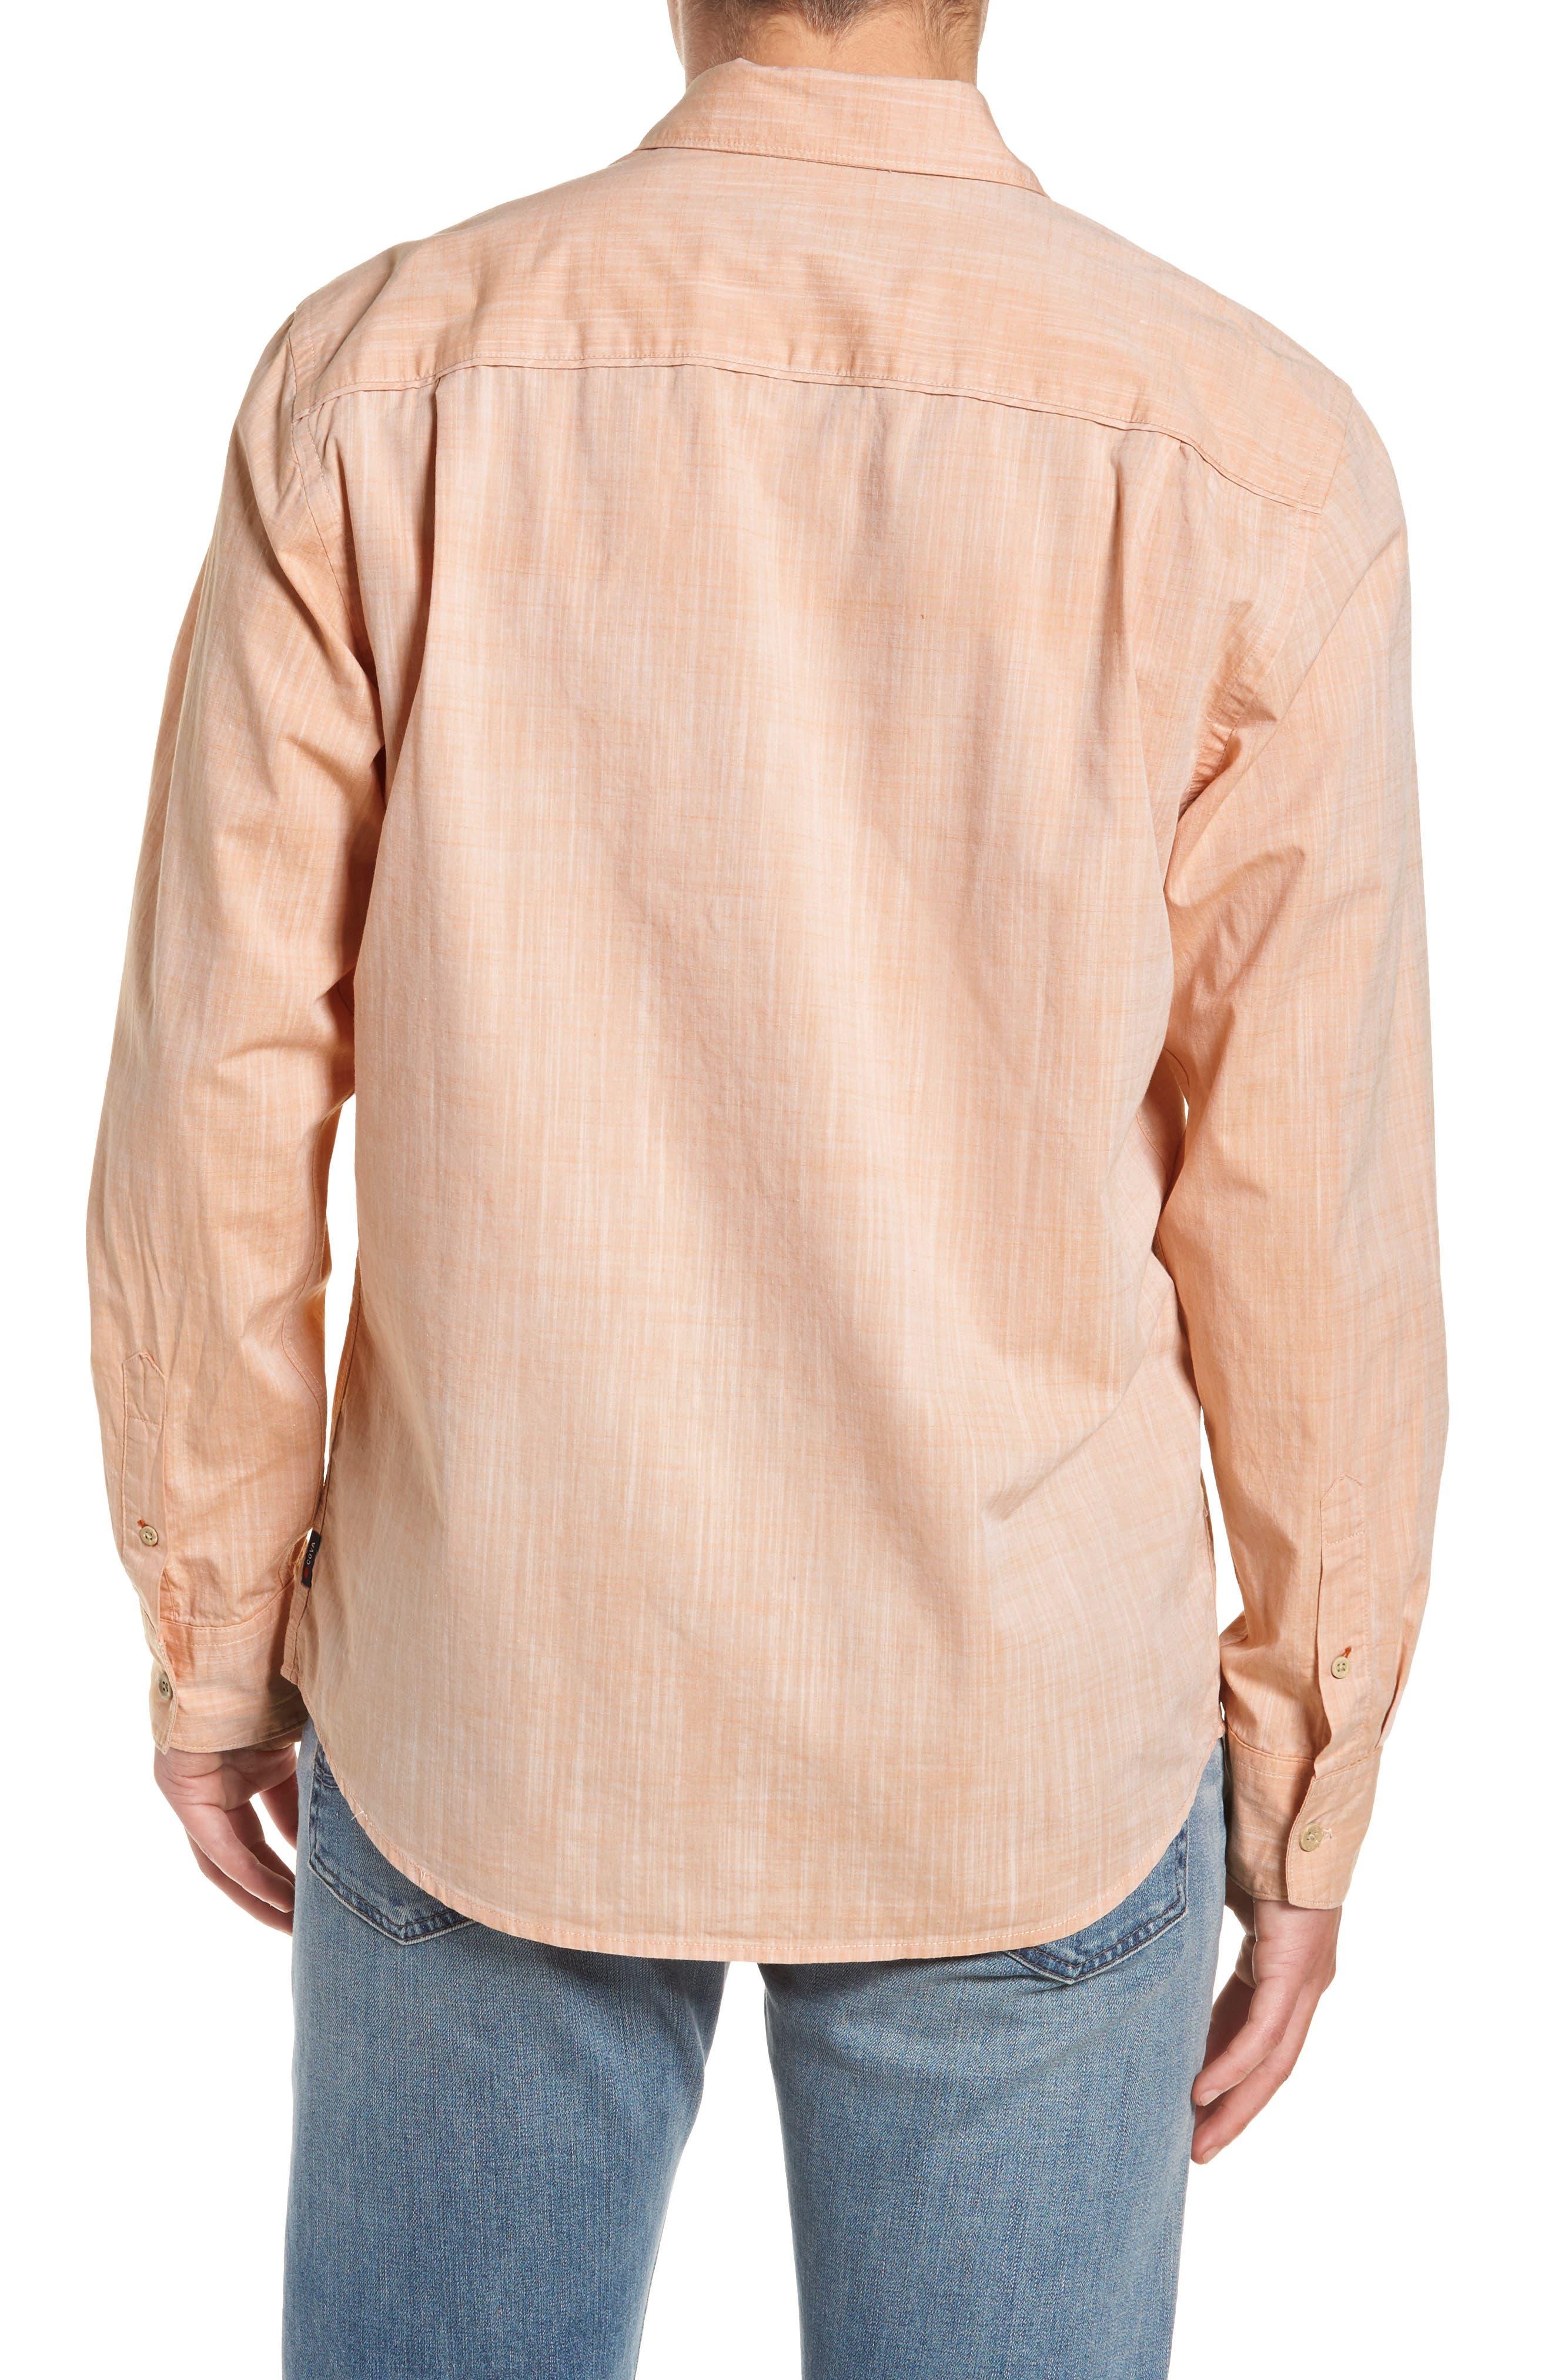 Mai Tai Regular Fit Sport Shirt,                             Alternate thumbnail 2, color,